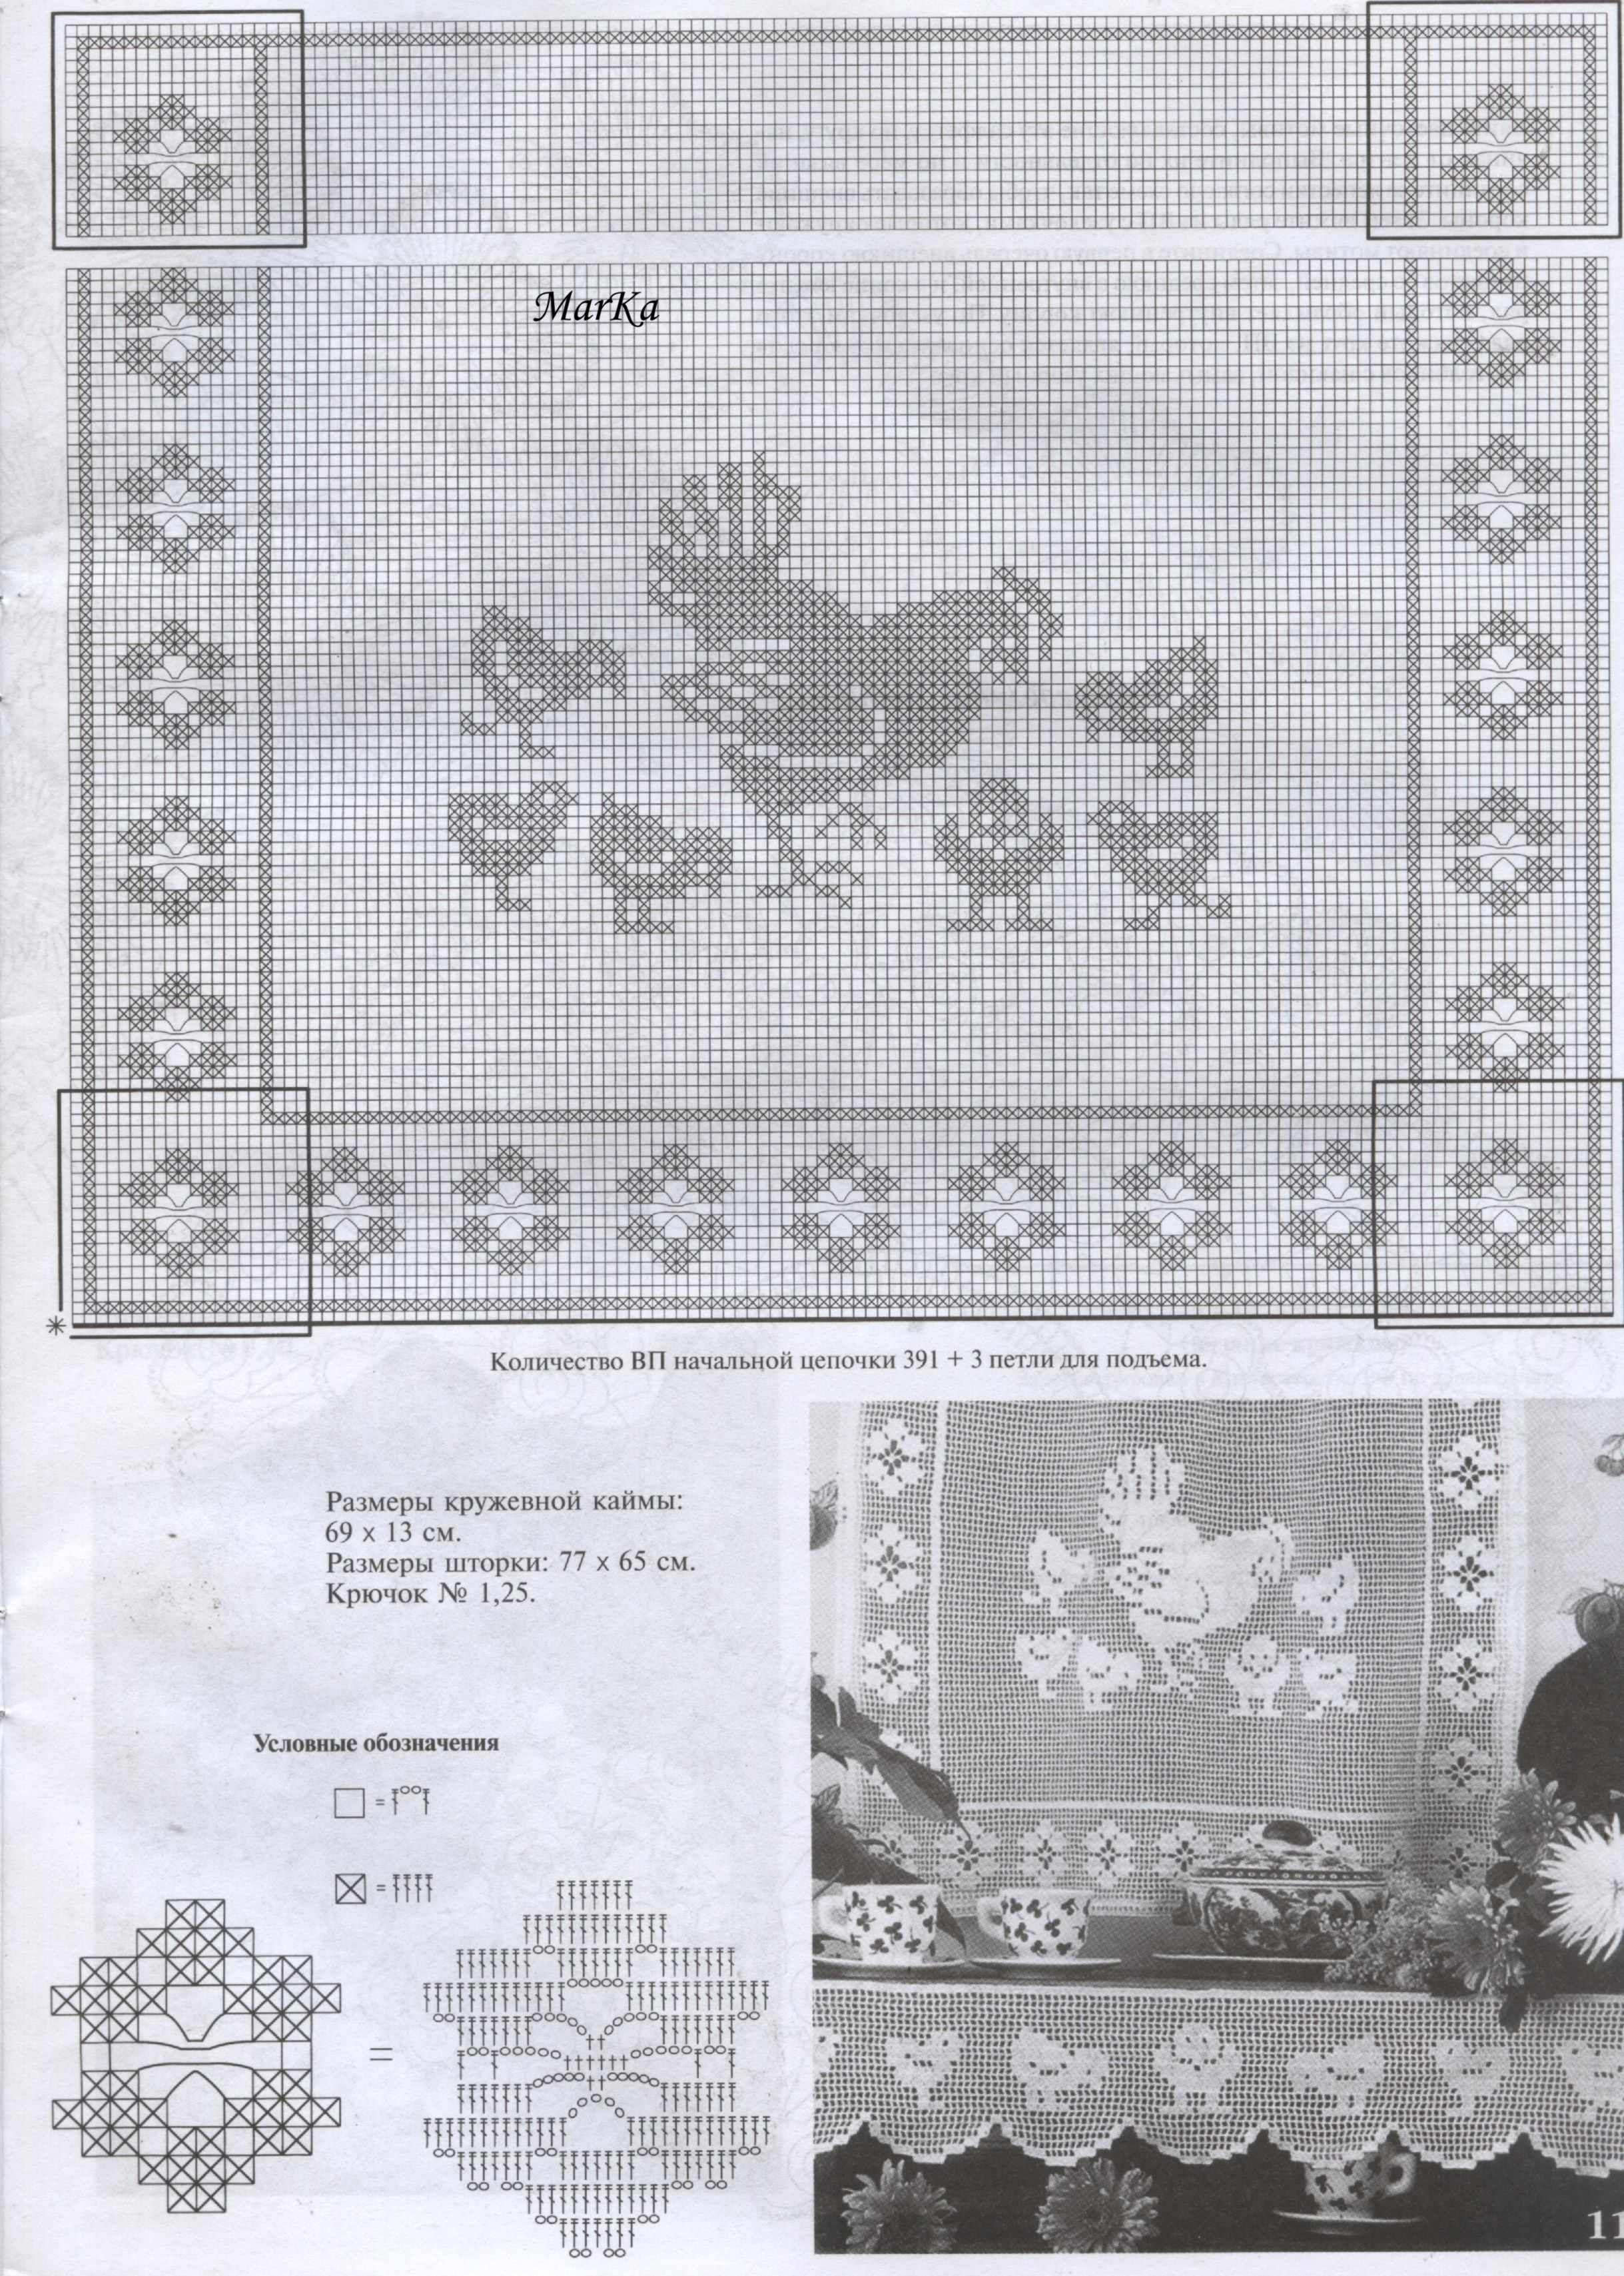 Hühner | cross stitch feathers and birds | Pinterest | Hühner ...